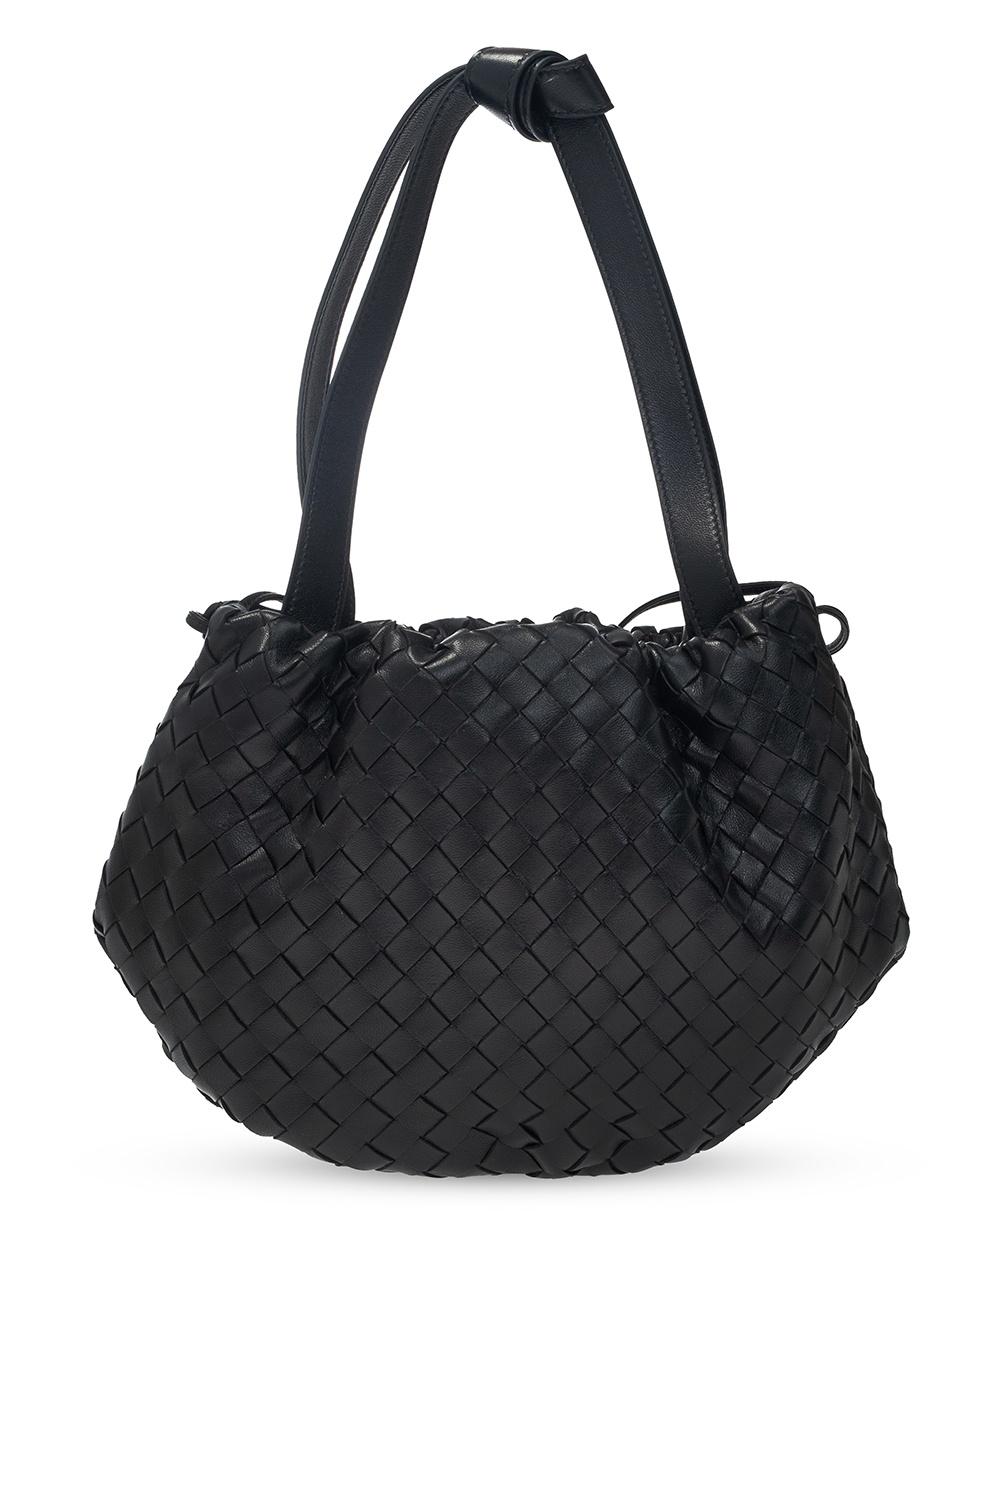 Bottega Veneta 'The Small Bulb' shoulder bag